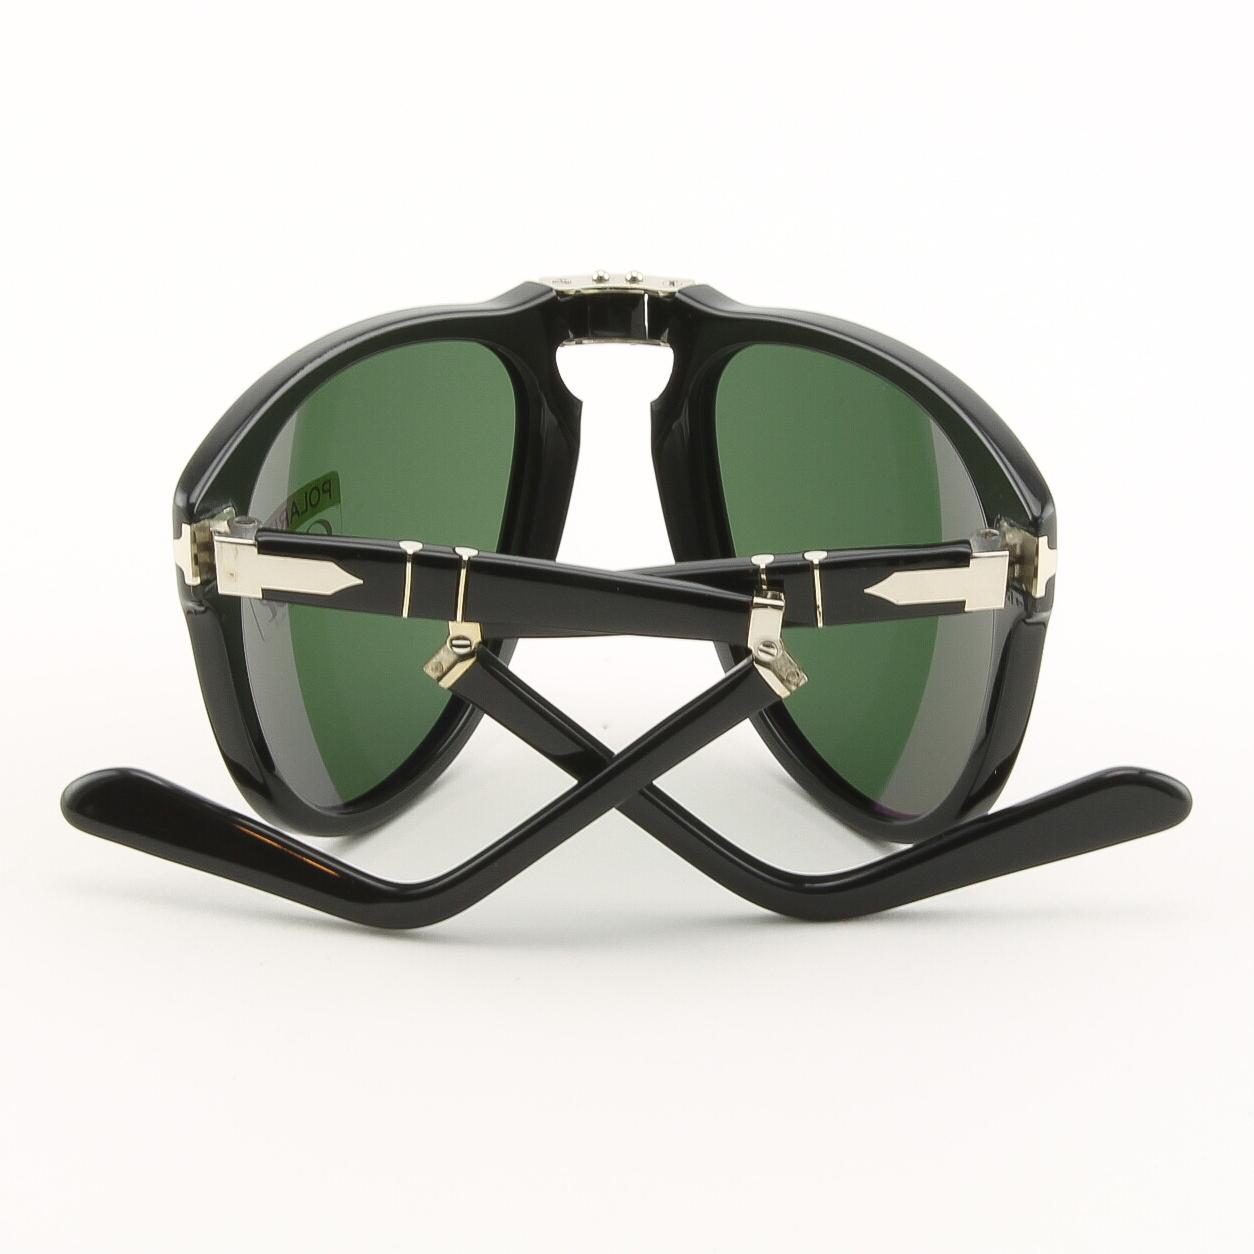 Persol 714 Folding Sunglasses 95/58 Black, Grey Green Polarized Lens PO0714 54mm | eBay